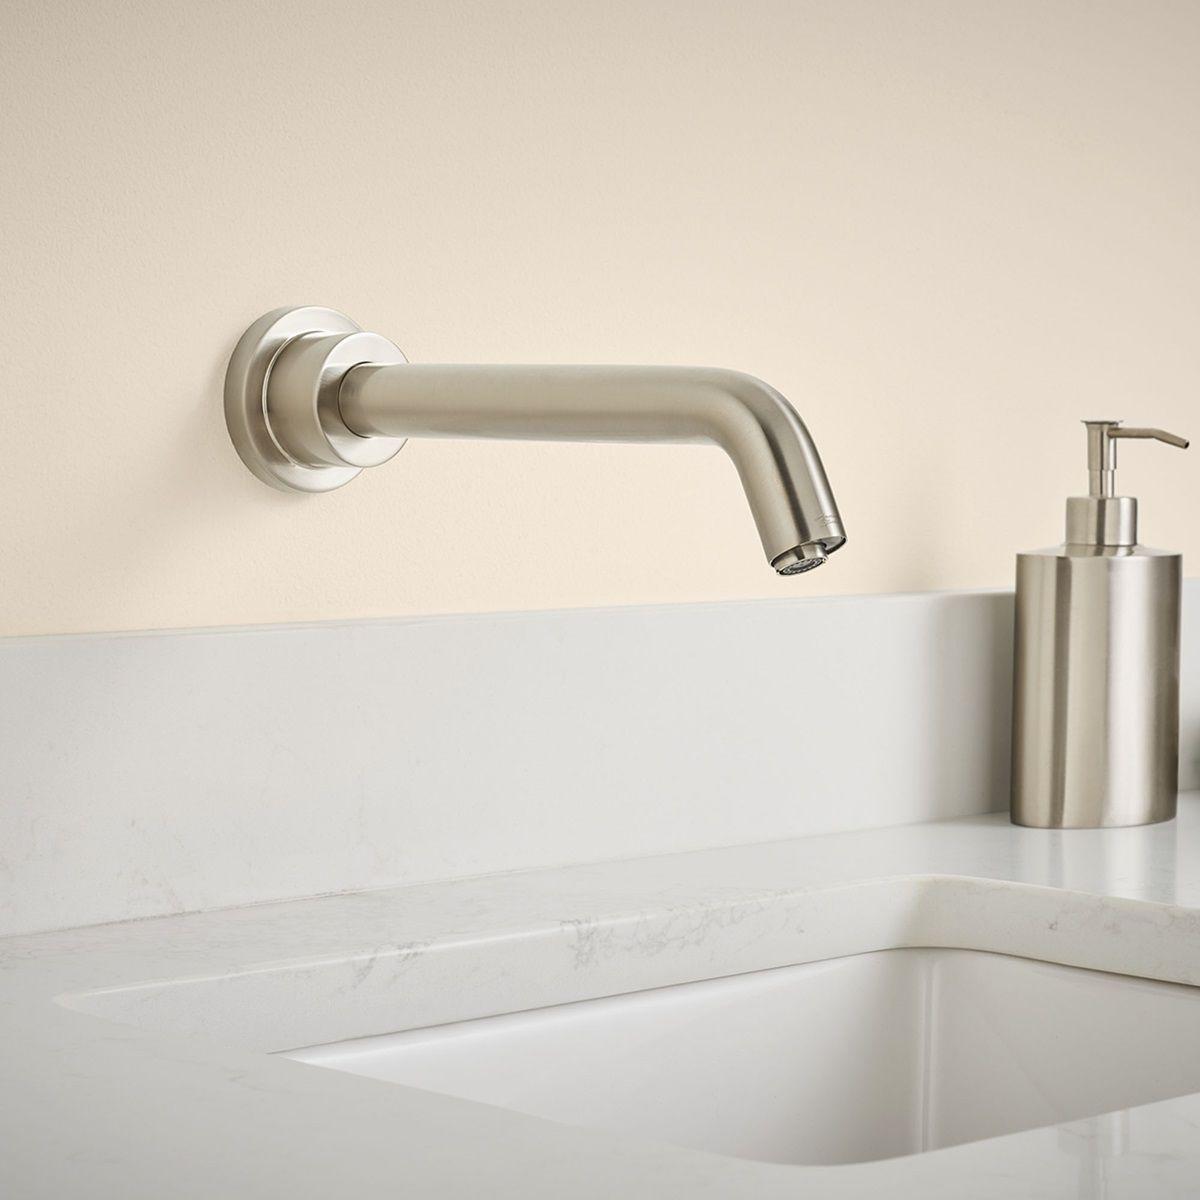 Serin Wall Mount Sensor Operated Faucet American Standard Wall Mount Faucet Bathroom Wall Mount Faucet Faucet